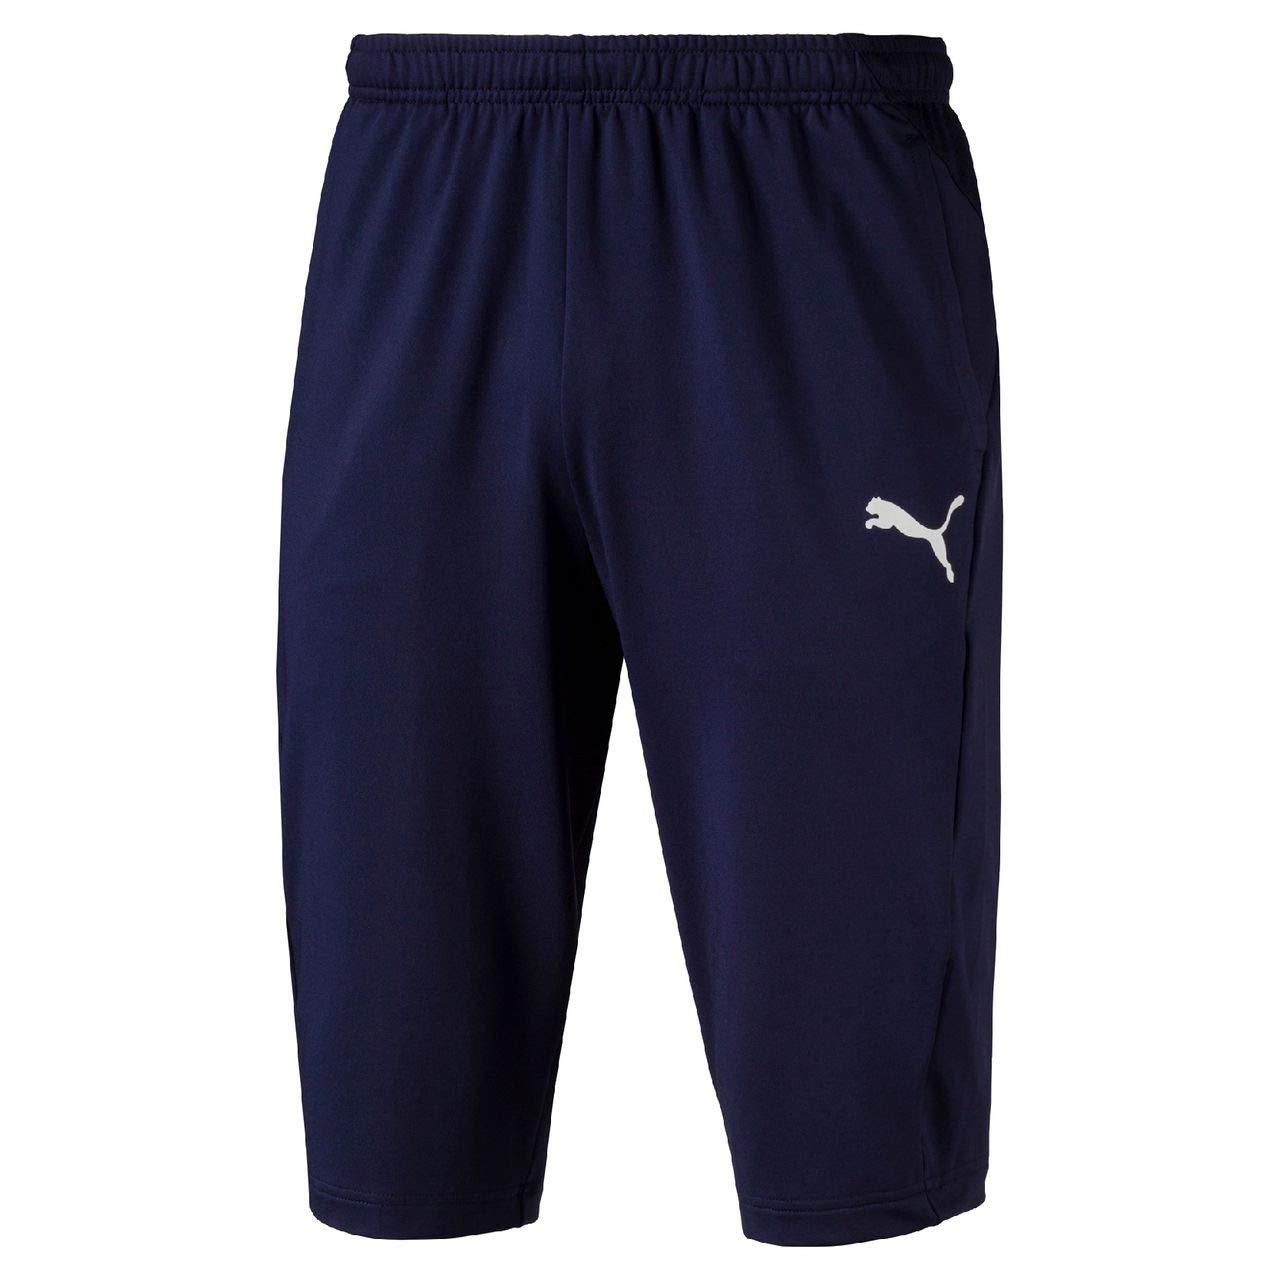 Puma Herren Liga Training 3/4 Pants Hose 655315